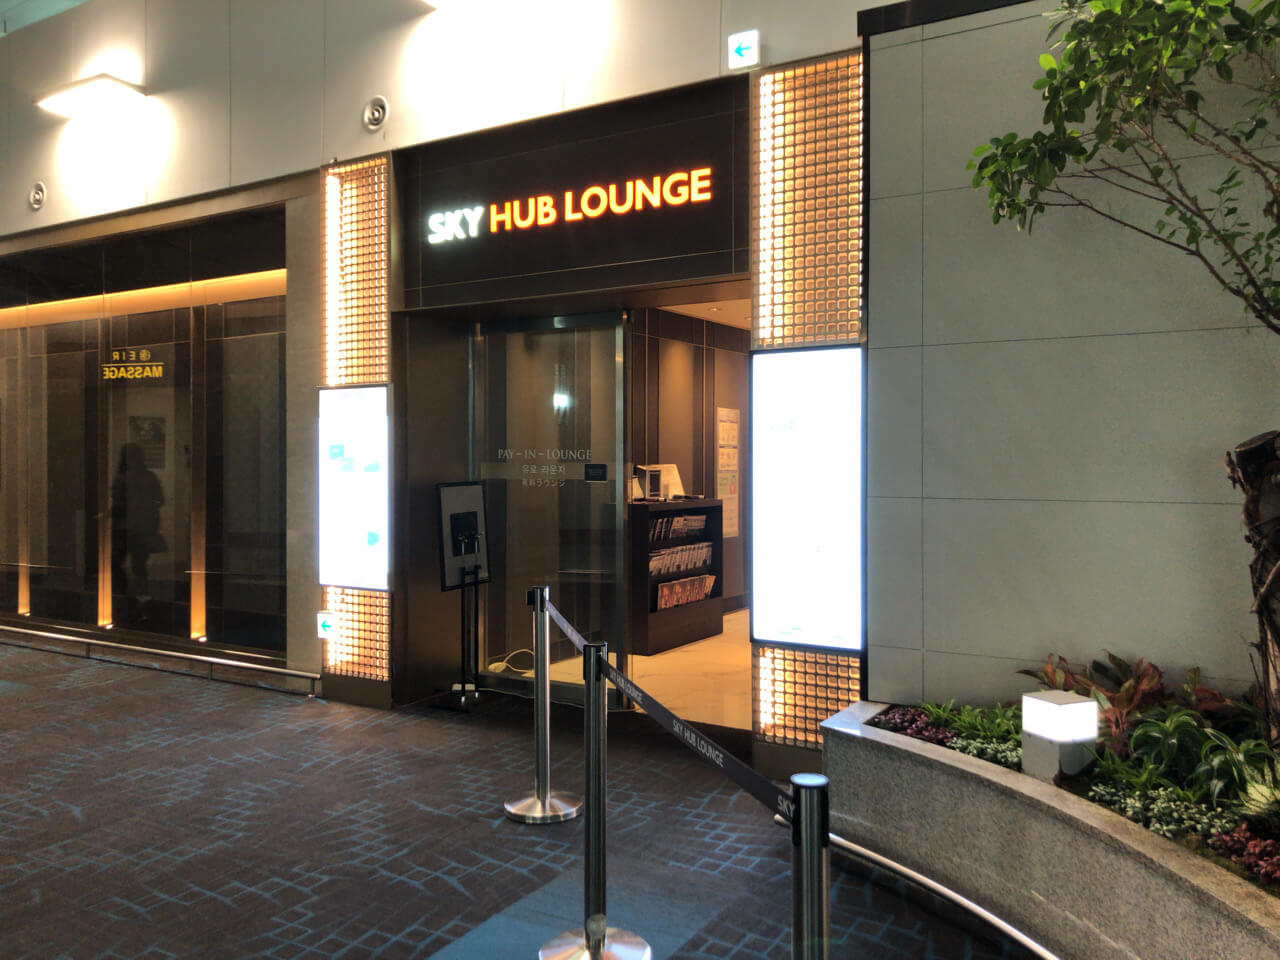 IMG 6120 - 【韓国 仁川空港】仁川ターミナル1にあるプライオリティーパスで入られるラウンジ「SKY HUB LOUNGE」